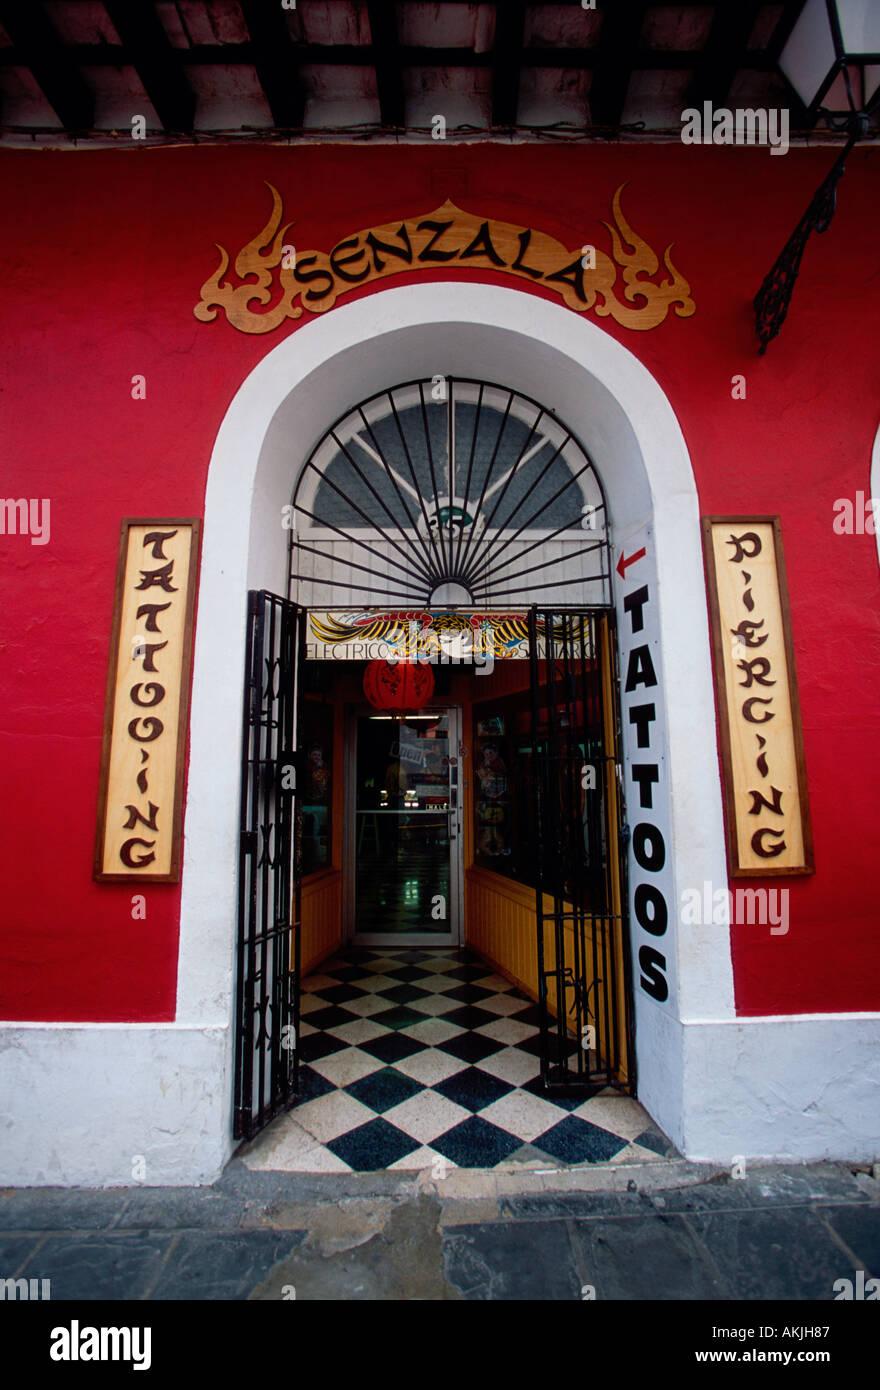 Senzala salon de tatouage, tatouage, tatouage, tatouage, body piercing, piercings, body art, Old San Juan, San Juan, Puerto Rico Photo Stock